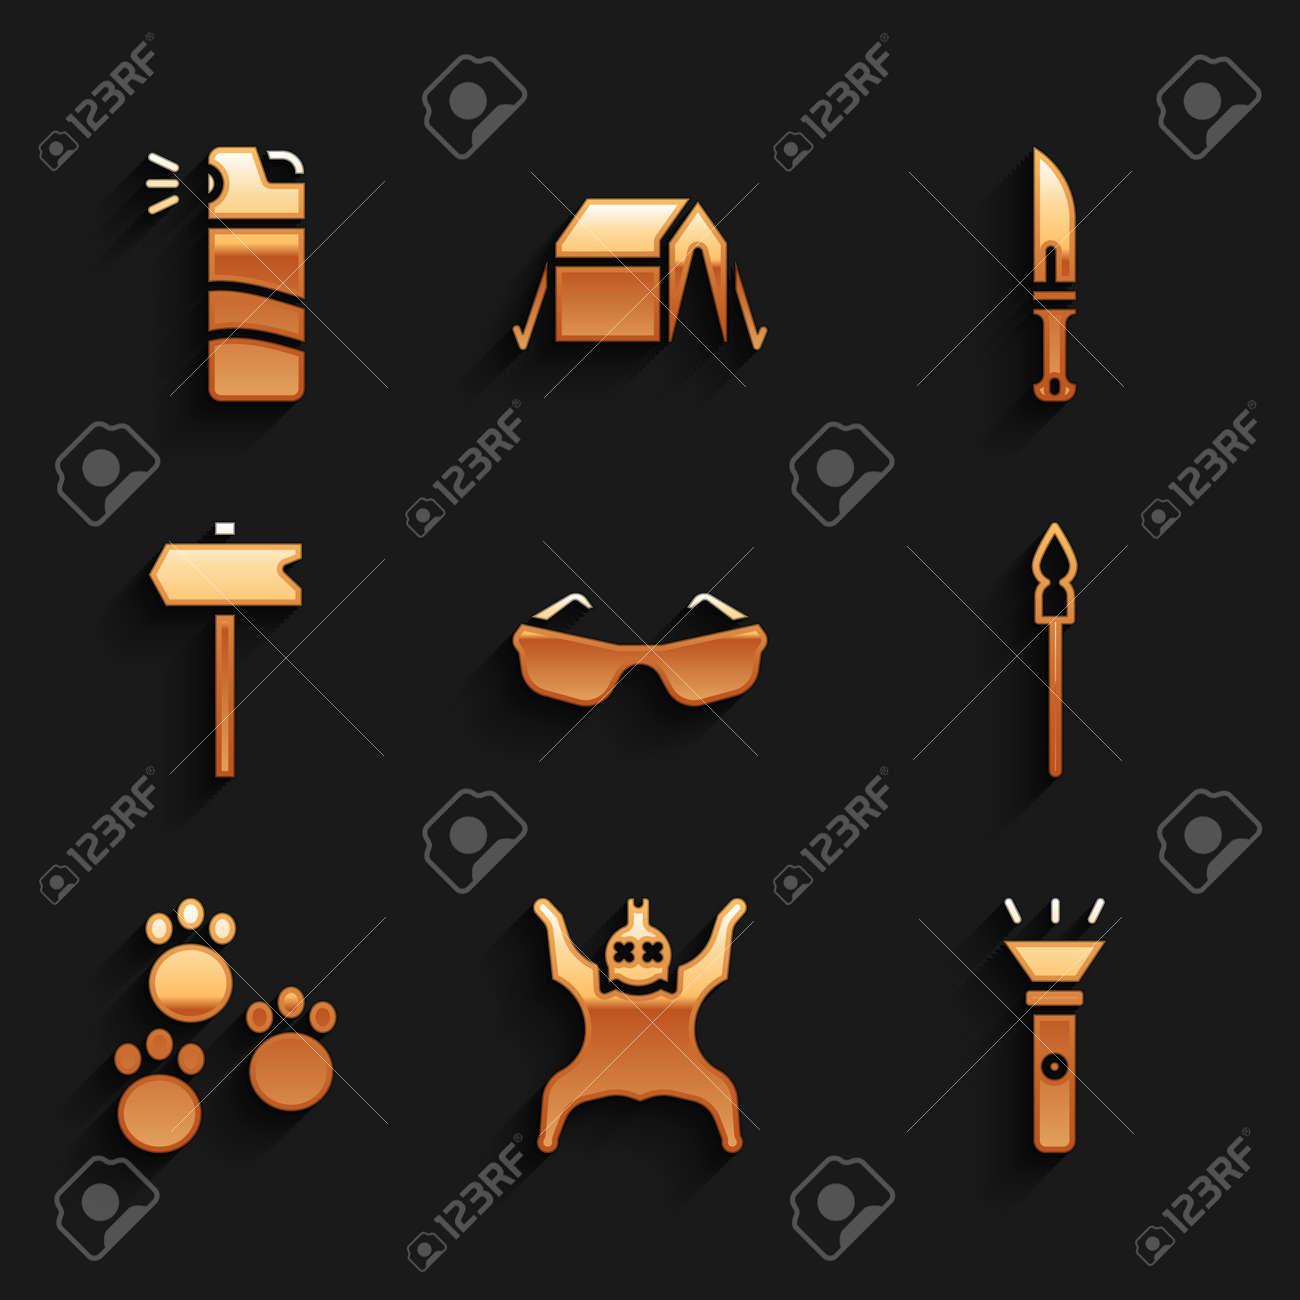 Set Glasses, Bear skin, Flashlight, Medieval spear, Paw print, Road traffic sign, Hunter knife and Pepper spray icon. Vector - 171781104